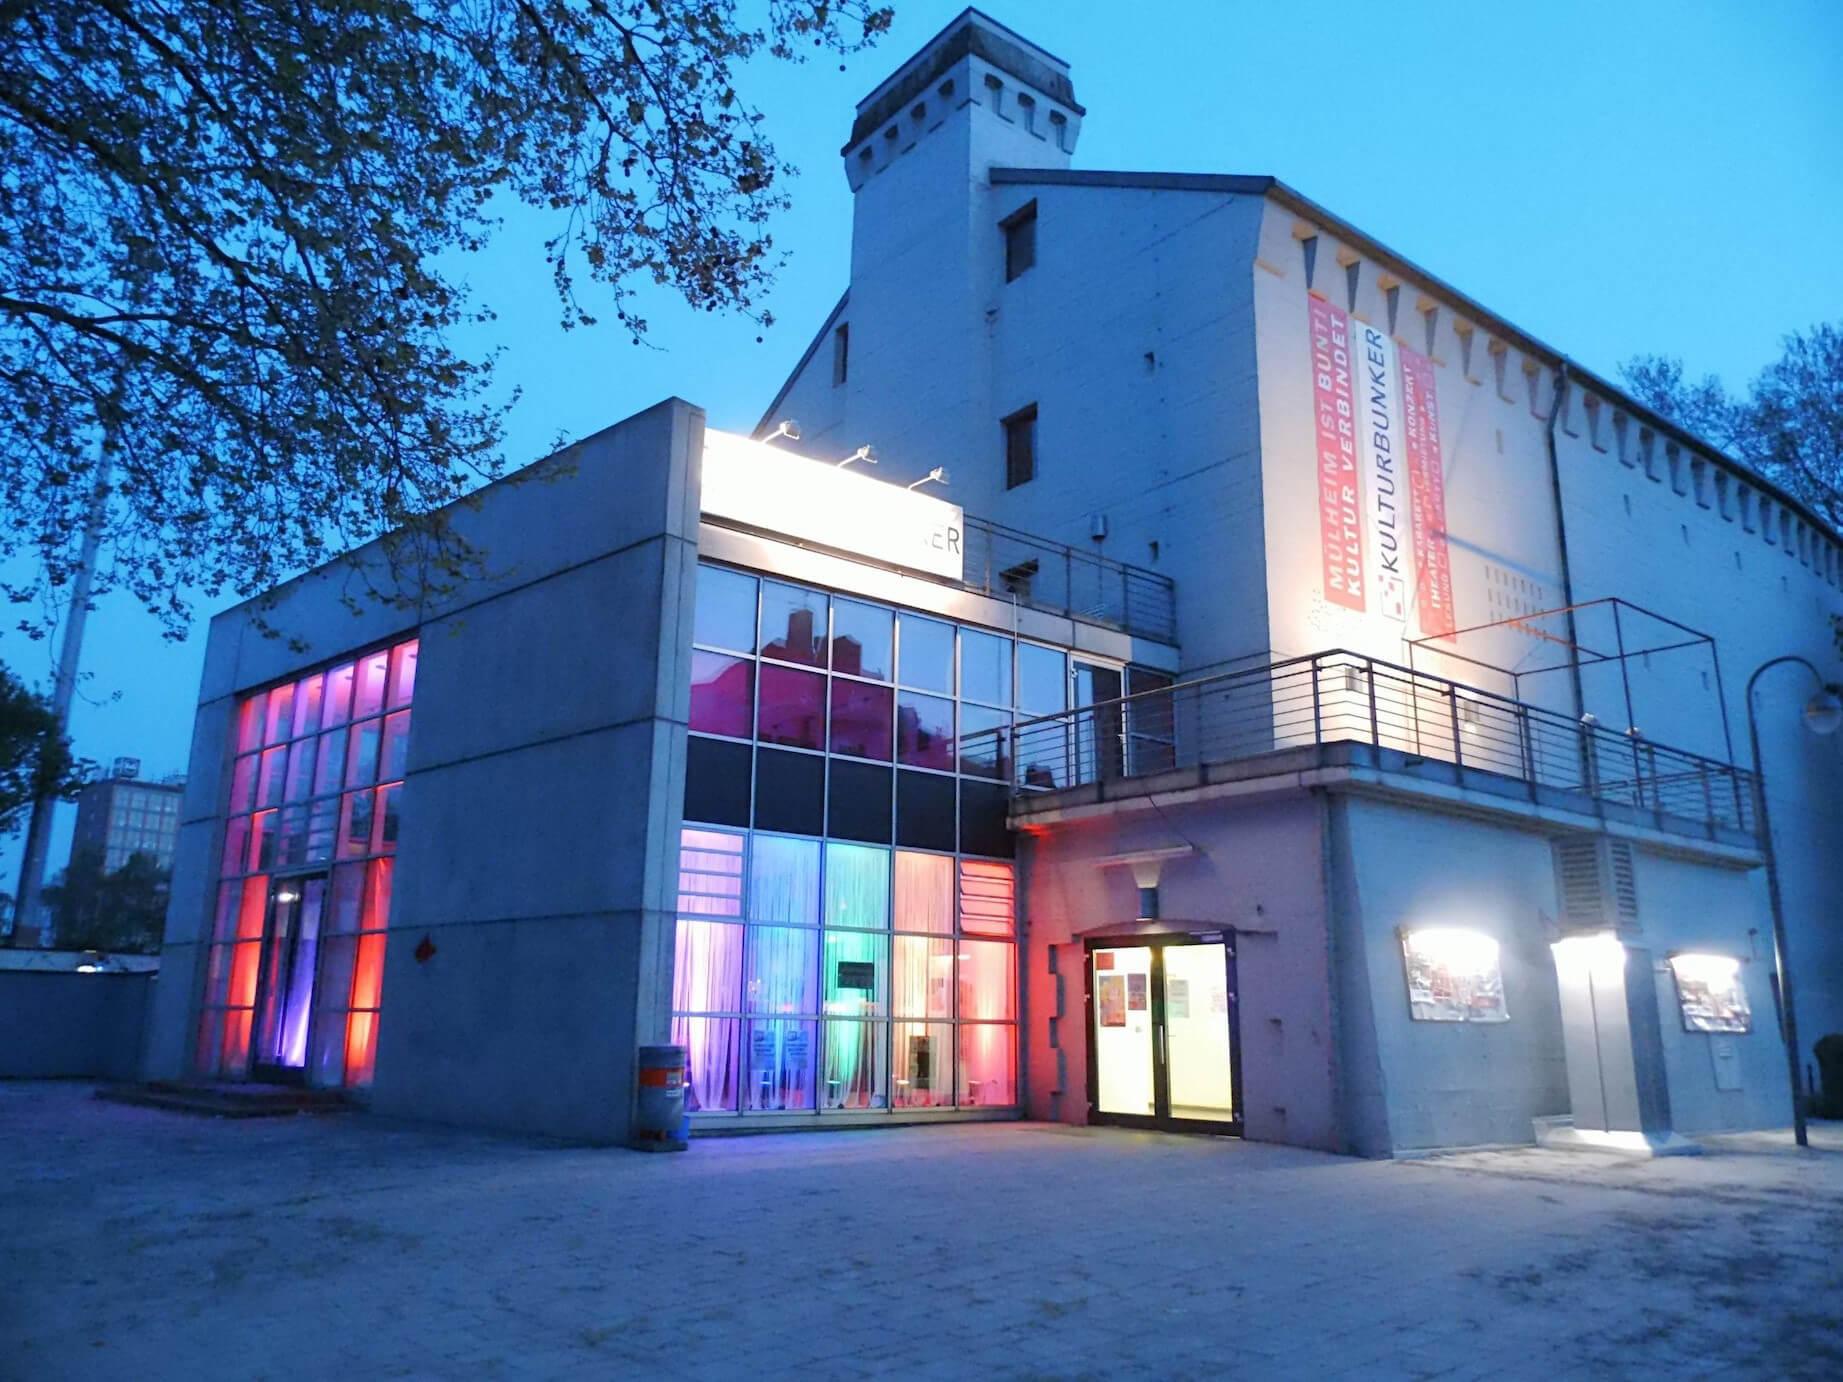 Kulturbunker Köln-Mülheim bei Nacht